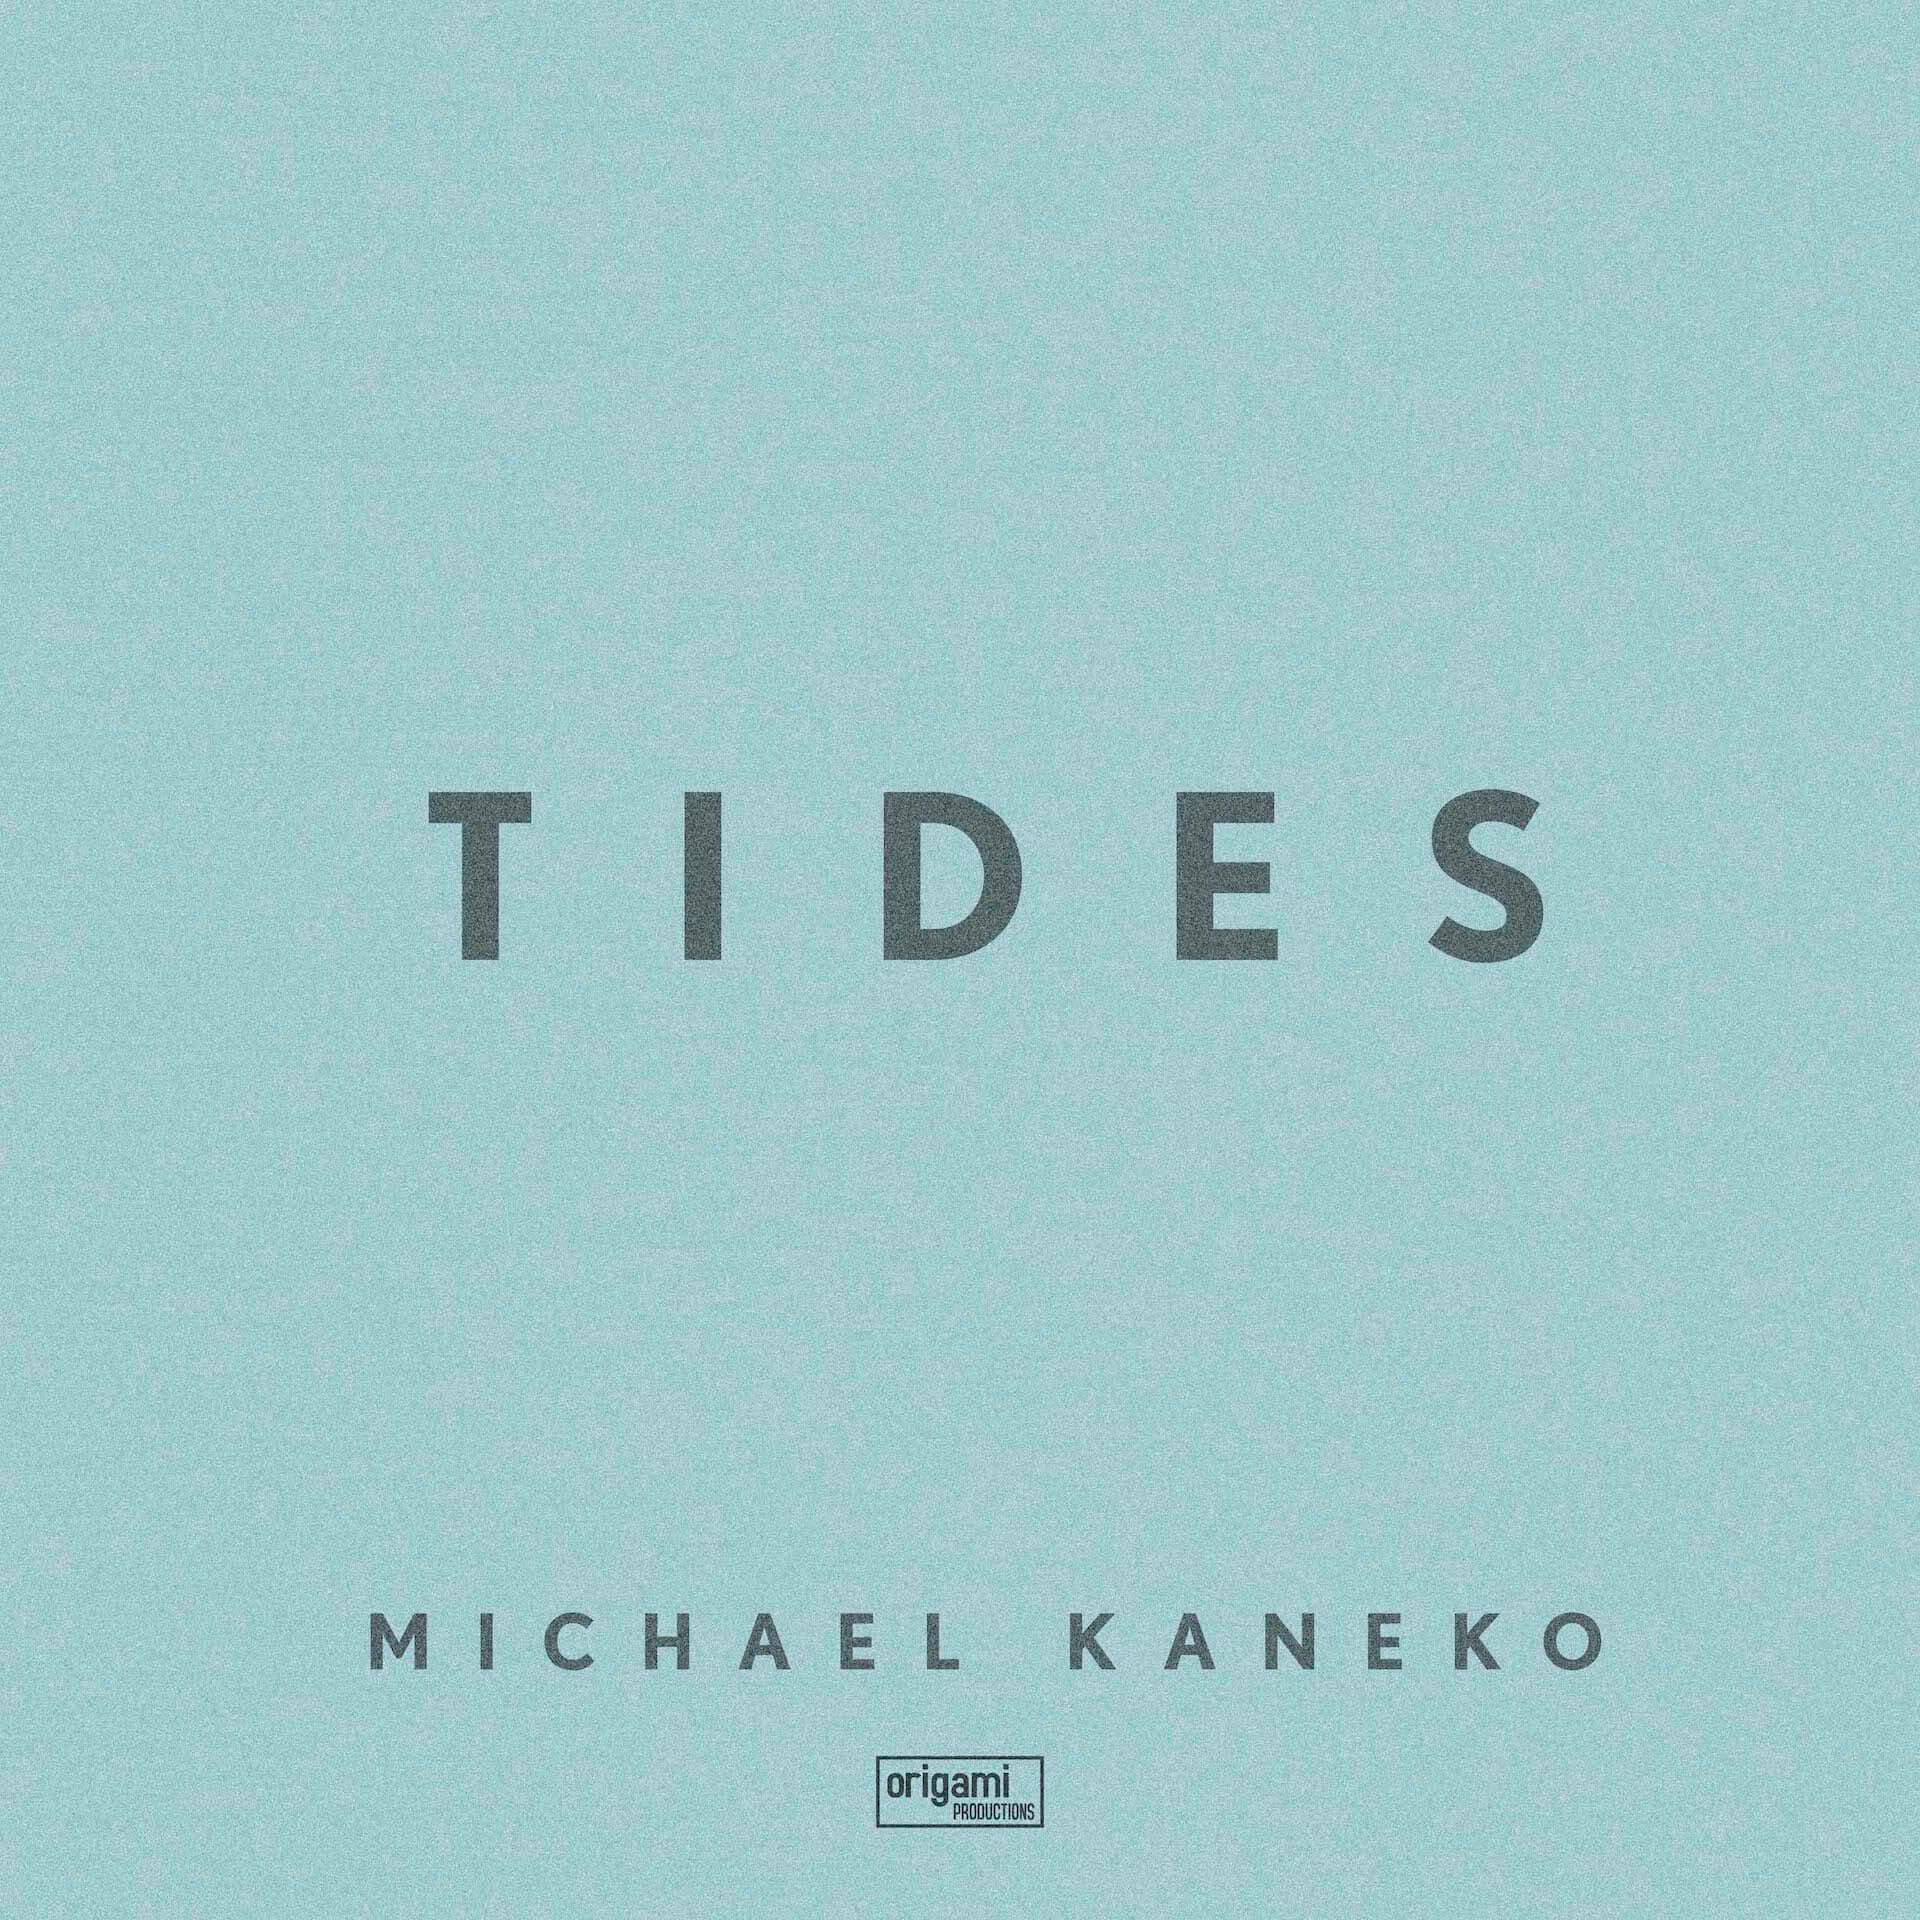 "Michael Kanekoがキャリア初、ピアノで制作した新曲""Tides""を急遽リリース|さまぁ〜ず、Baby Kieとの共演ムービーも公開中 music200701_michaellaneko_1-1920x1920"